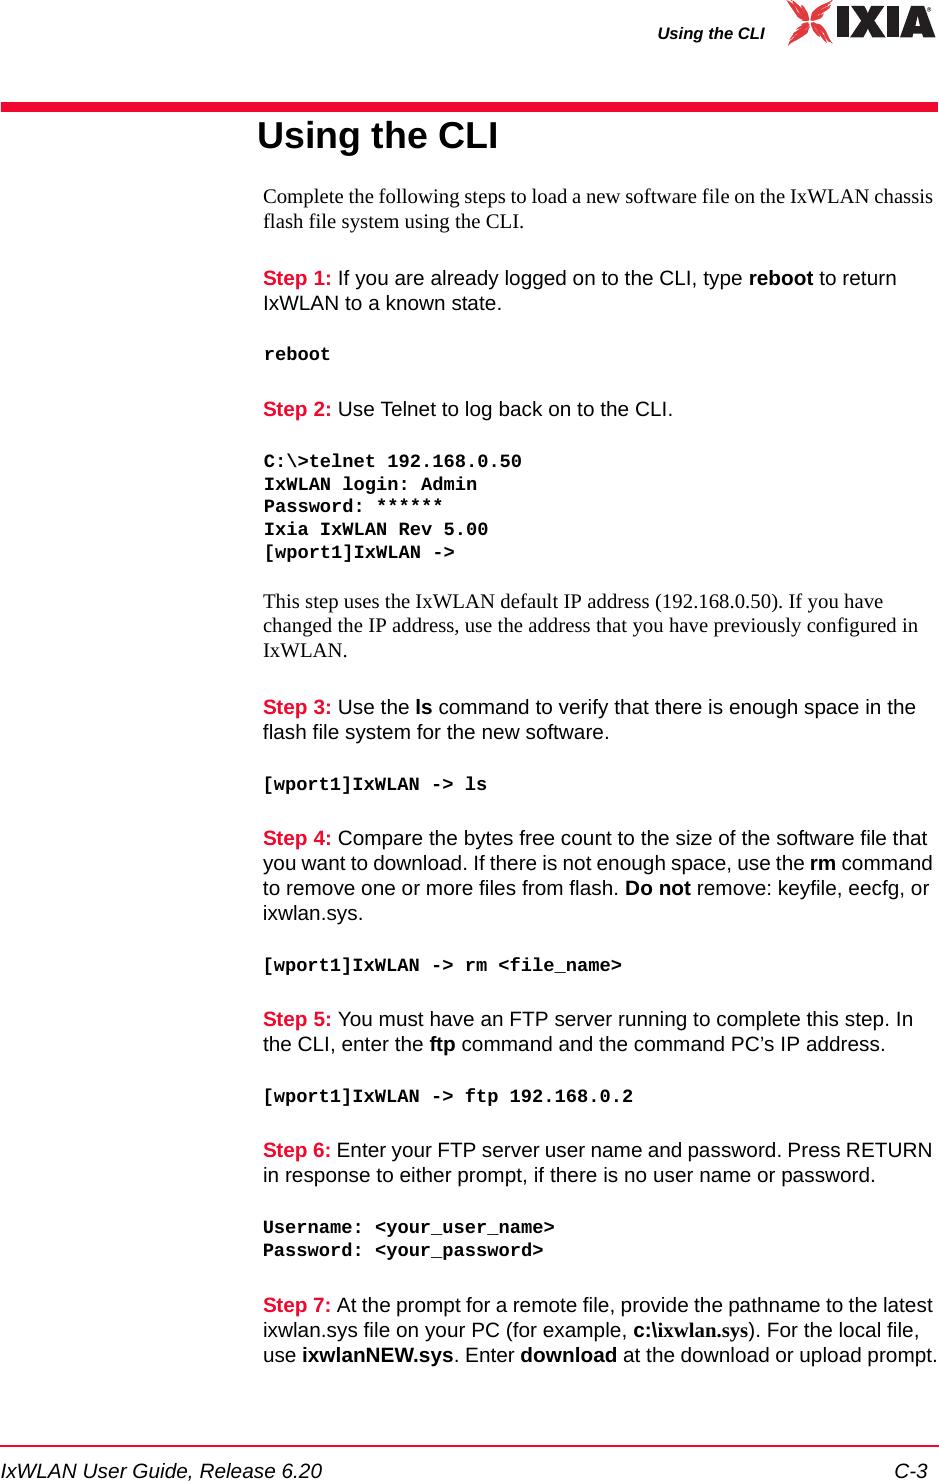 Ixia EE11ABG5 IxWLAN SED User Manual IxWLANUserGuide